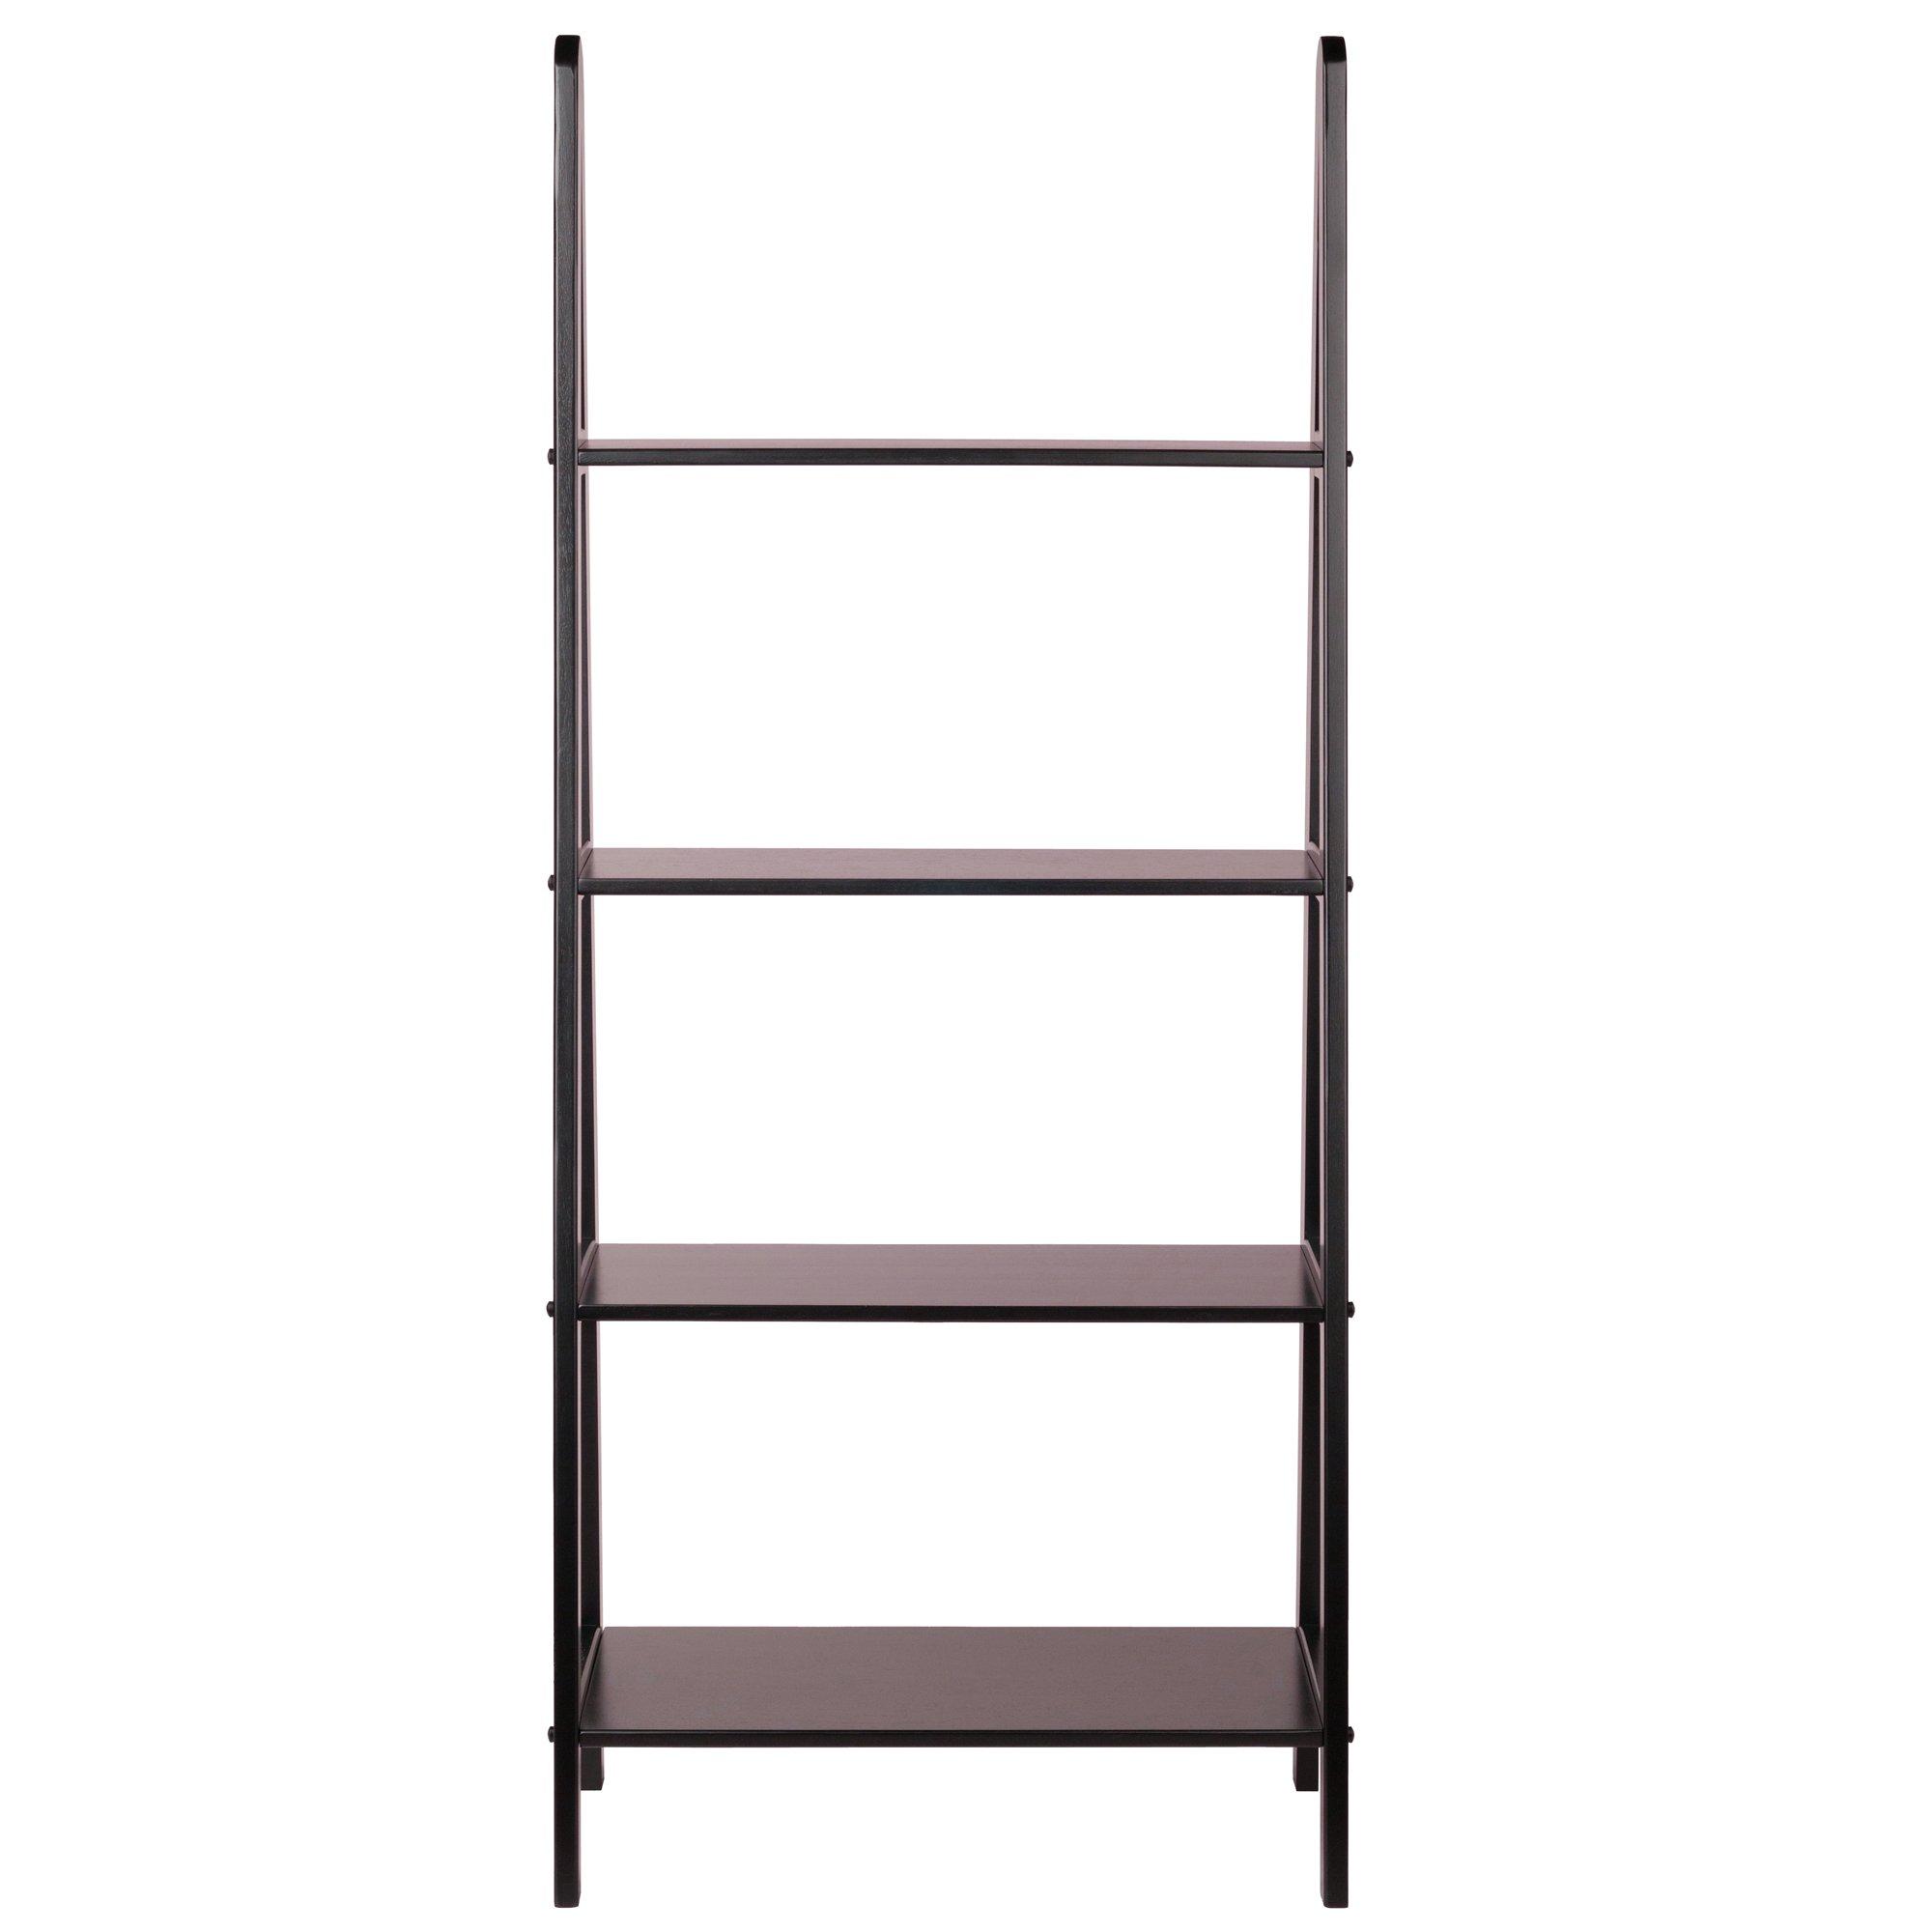 Winsome Wood 4-Tier A-Frame Shelf, Dark Espresso by Winsome Wood (Image #3)